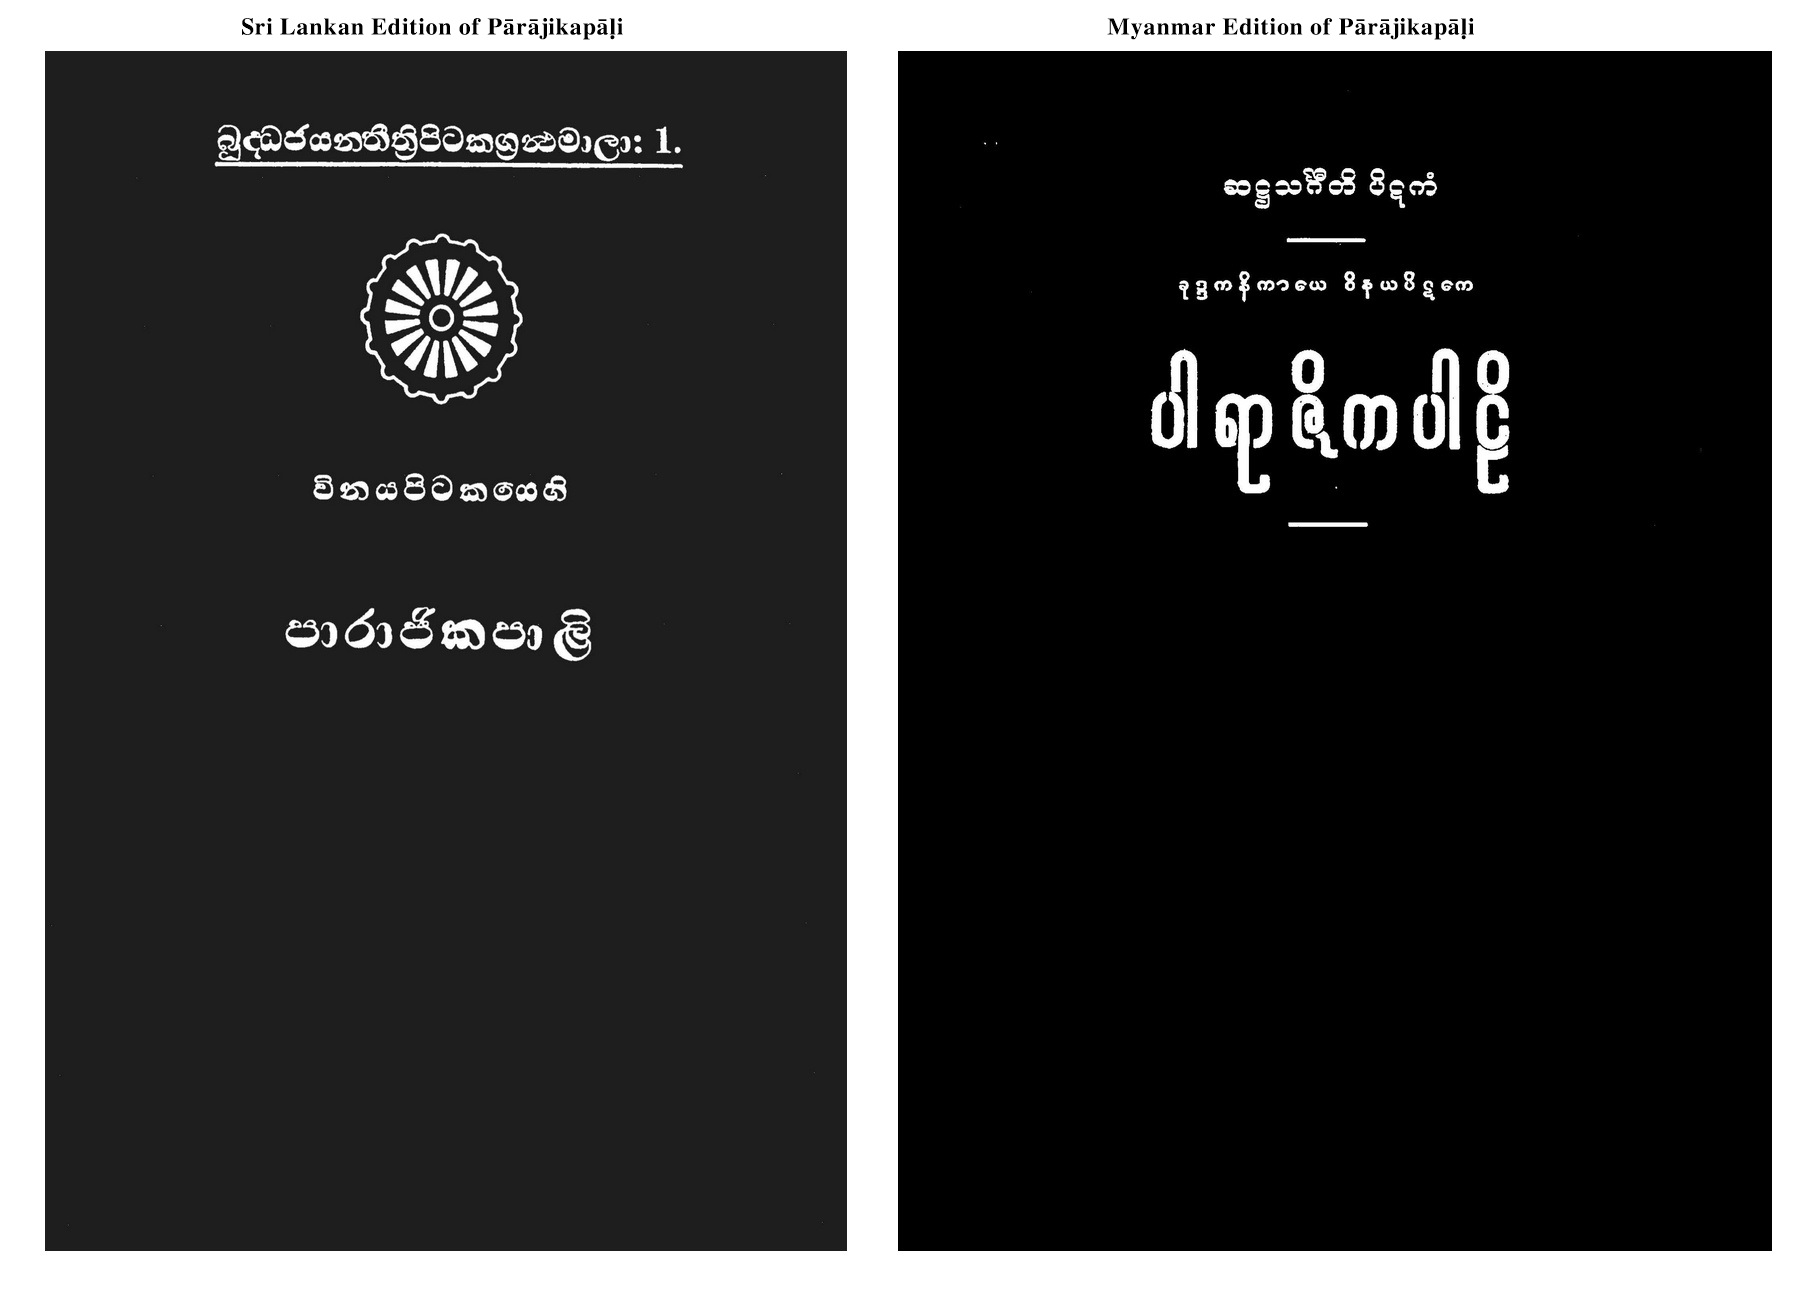 Pali Text Image